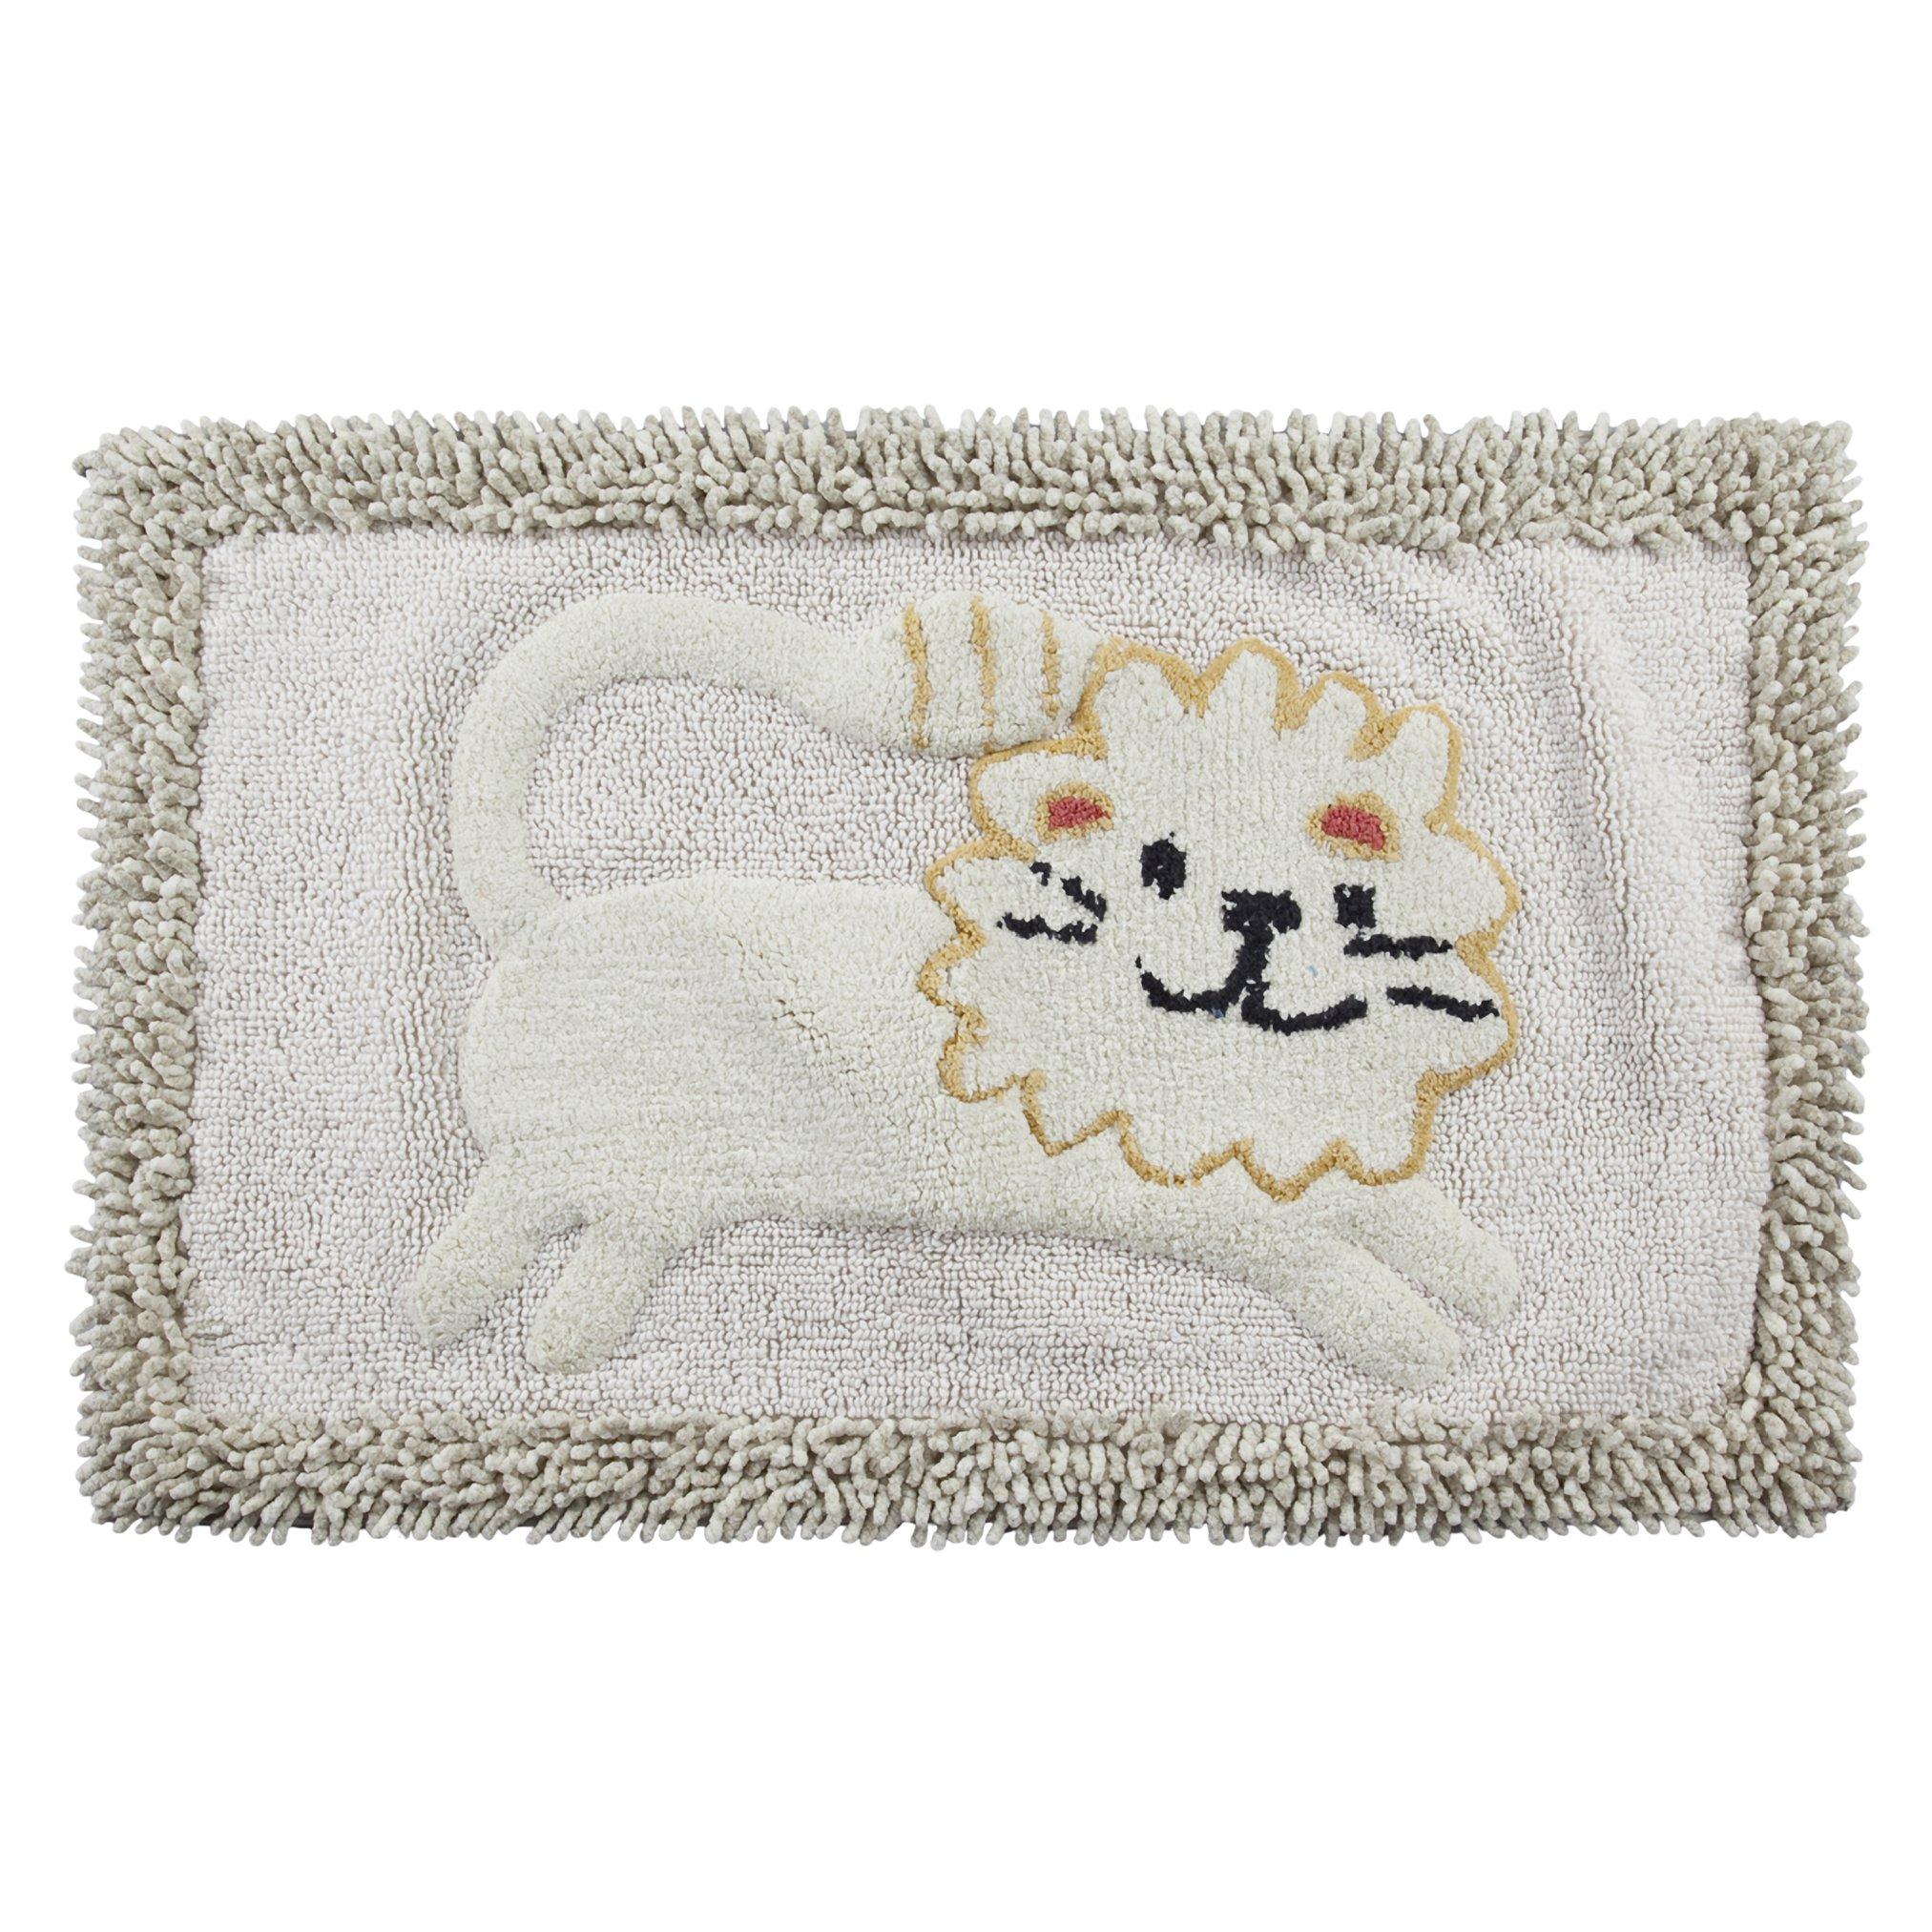 Creative Bath Products Animal Crackers Bath Rug